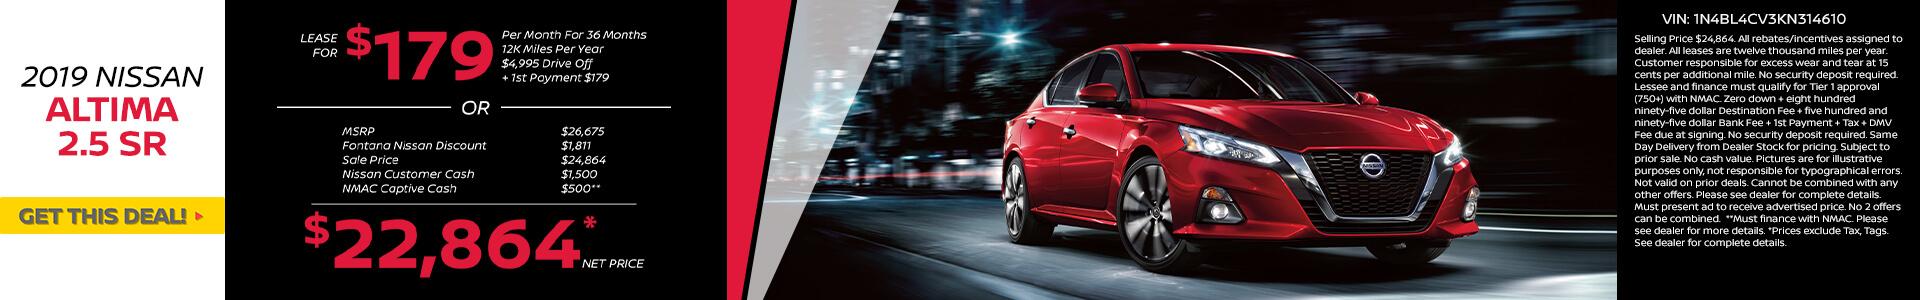 Nissan Altima $179 Lease